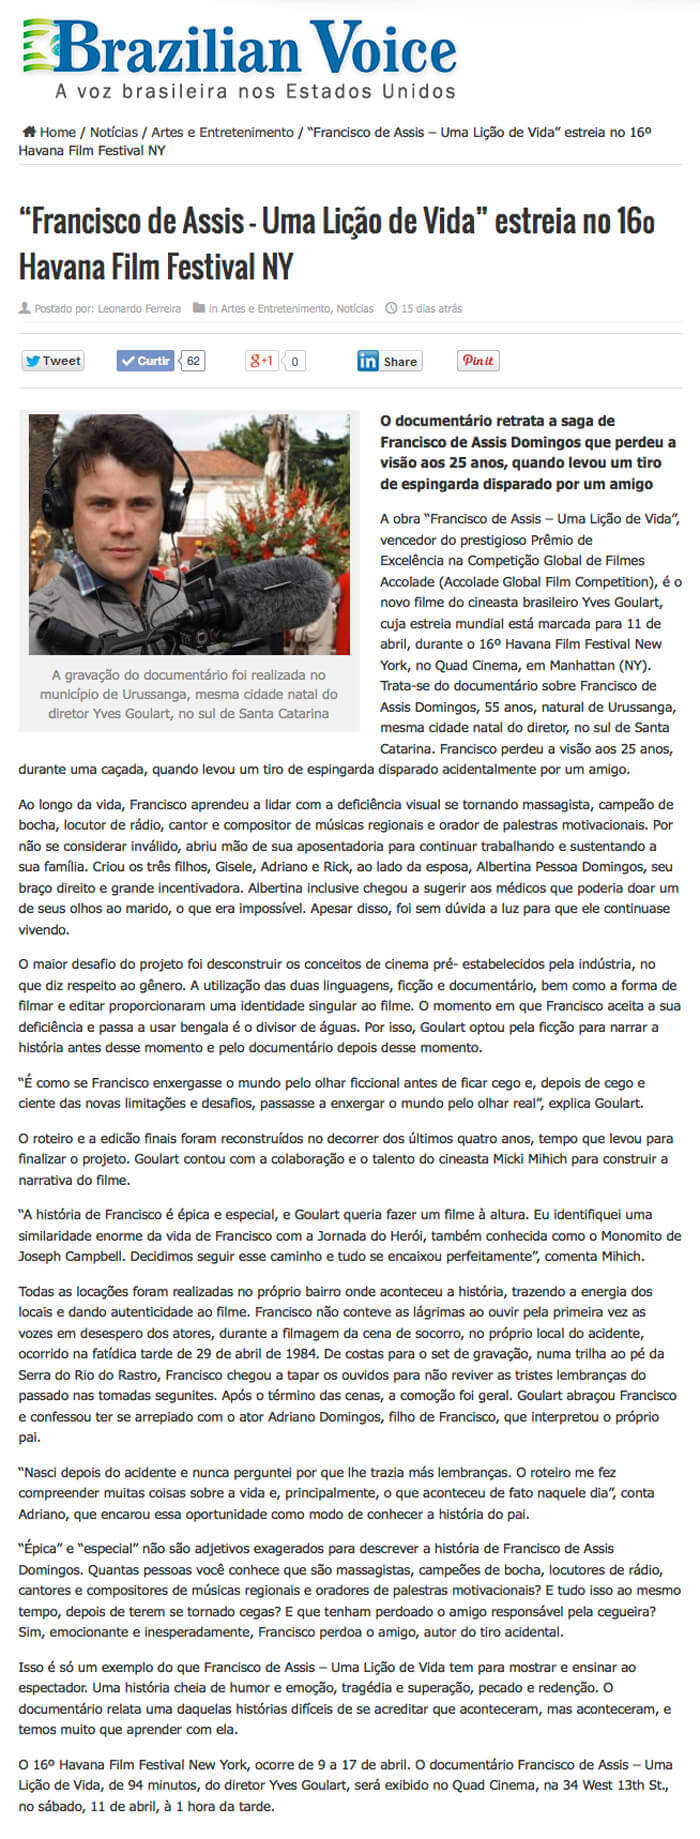 Brazilian Voice: Francisco de Assis - A Life Lesson premieres at the 16th Havana Film Festival NY